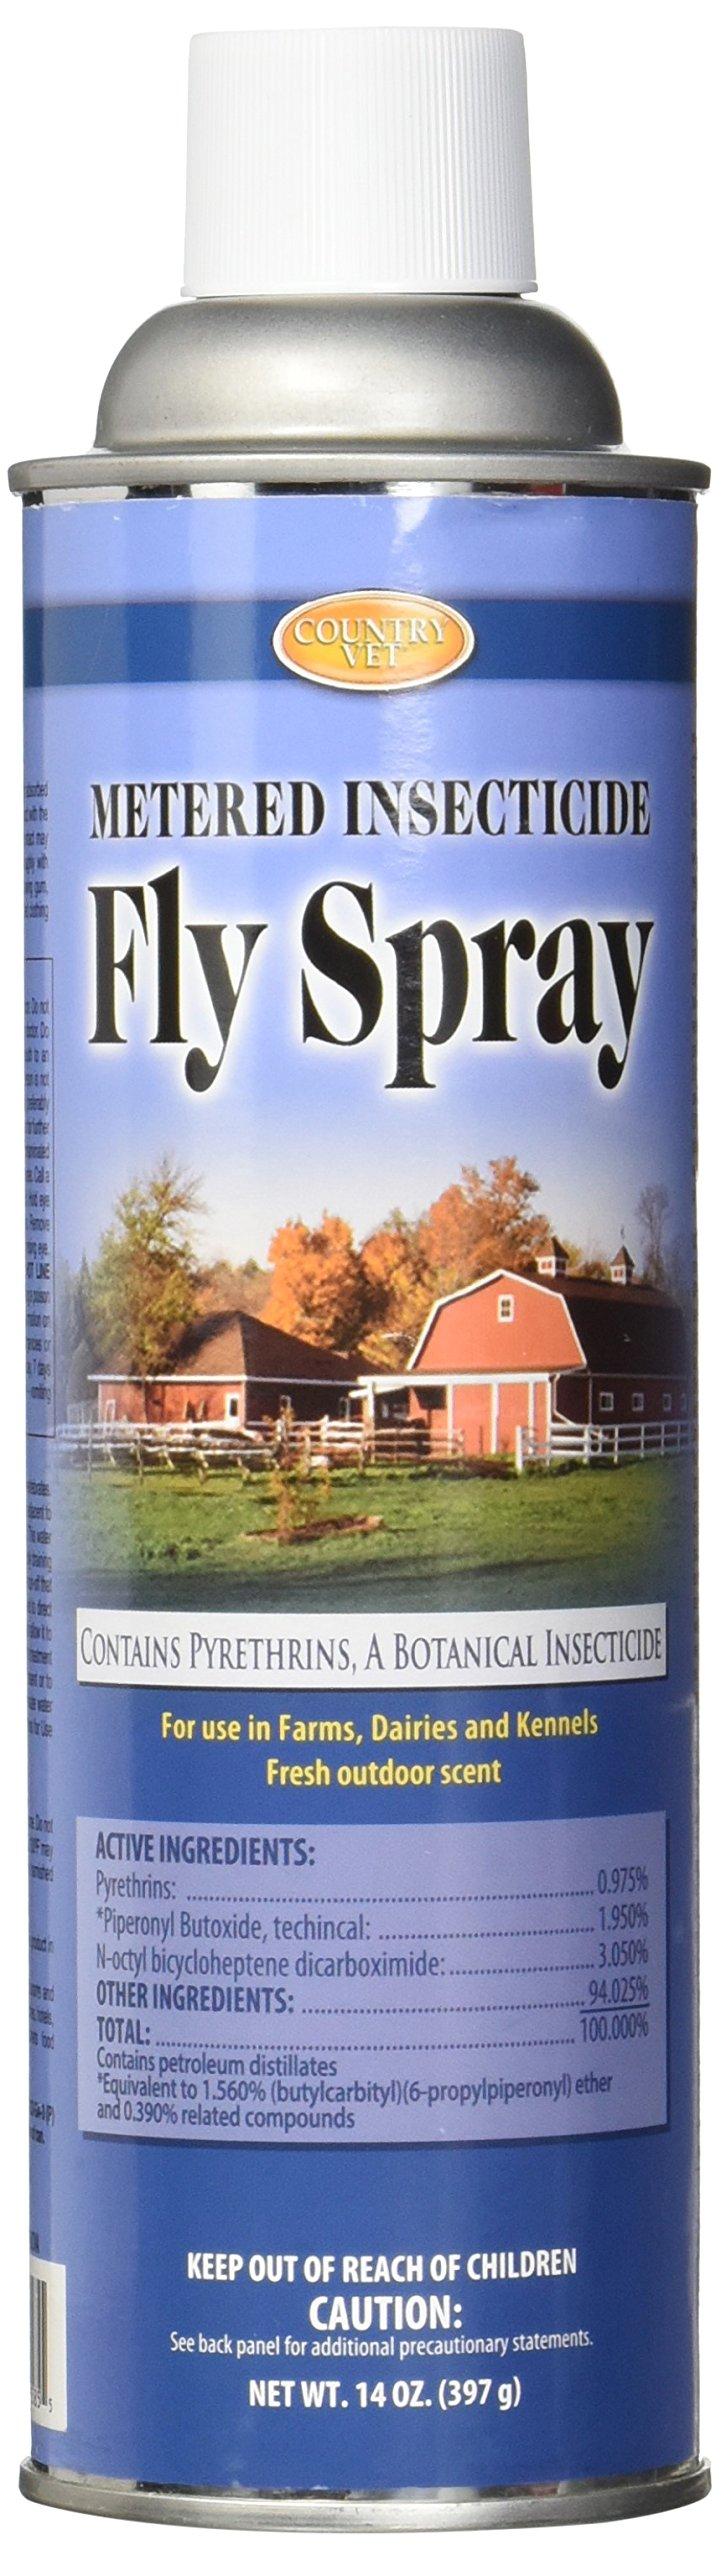 Country Vet Macro Fly Manager Spray Refill, 14 oz